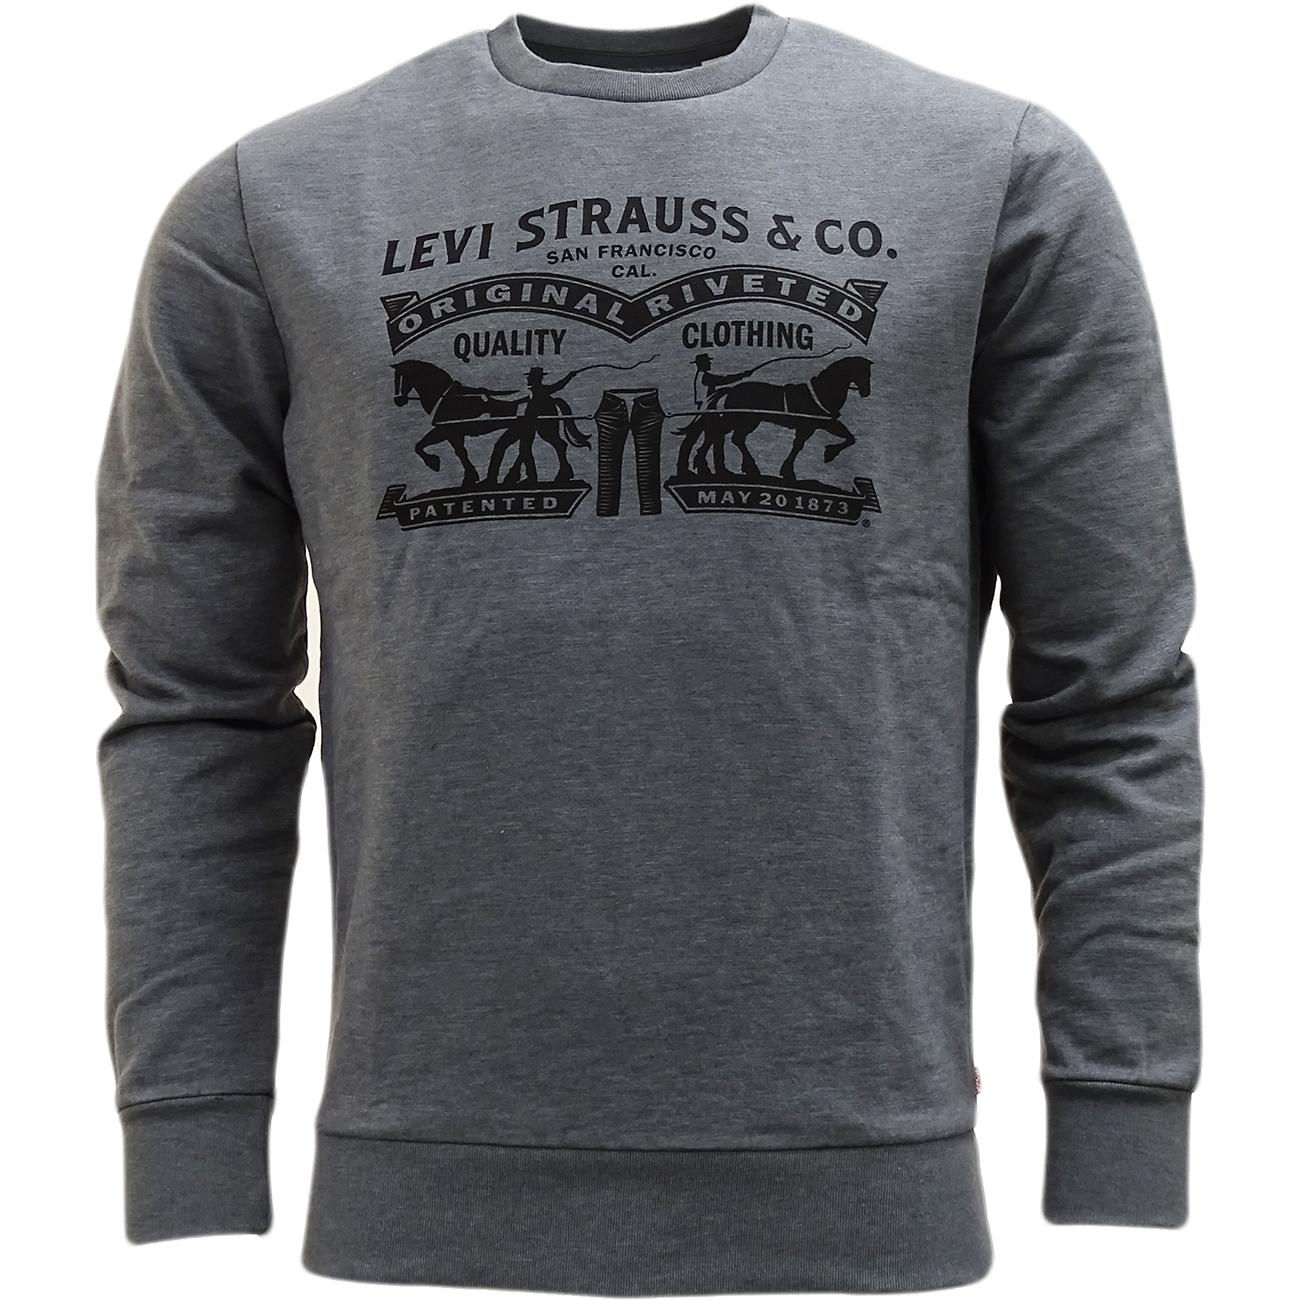 Levis hoodies